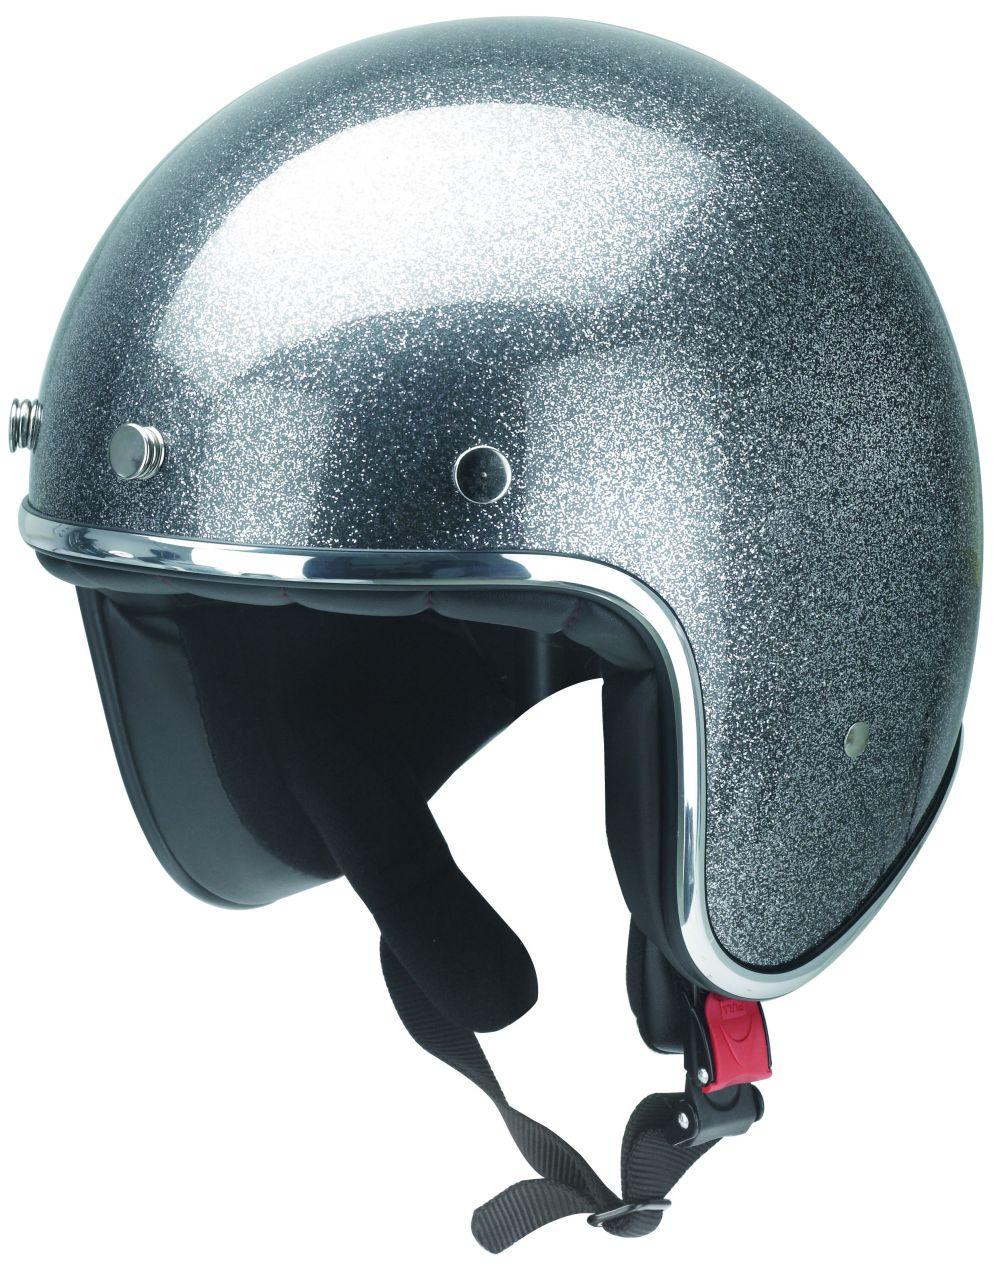 Motorrad Helm Motorradhelm Jethelm Kochmann Metallic Grau XS S M L XL XXL